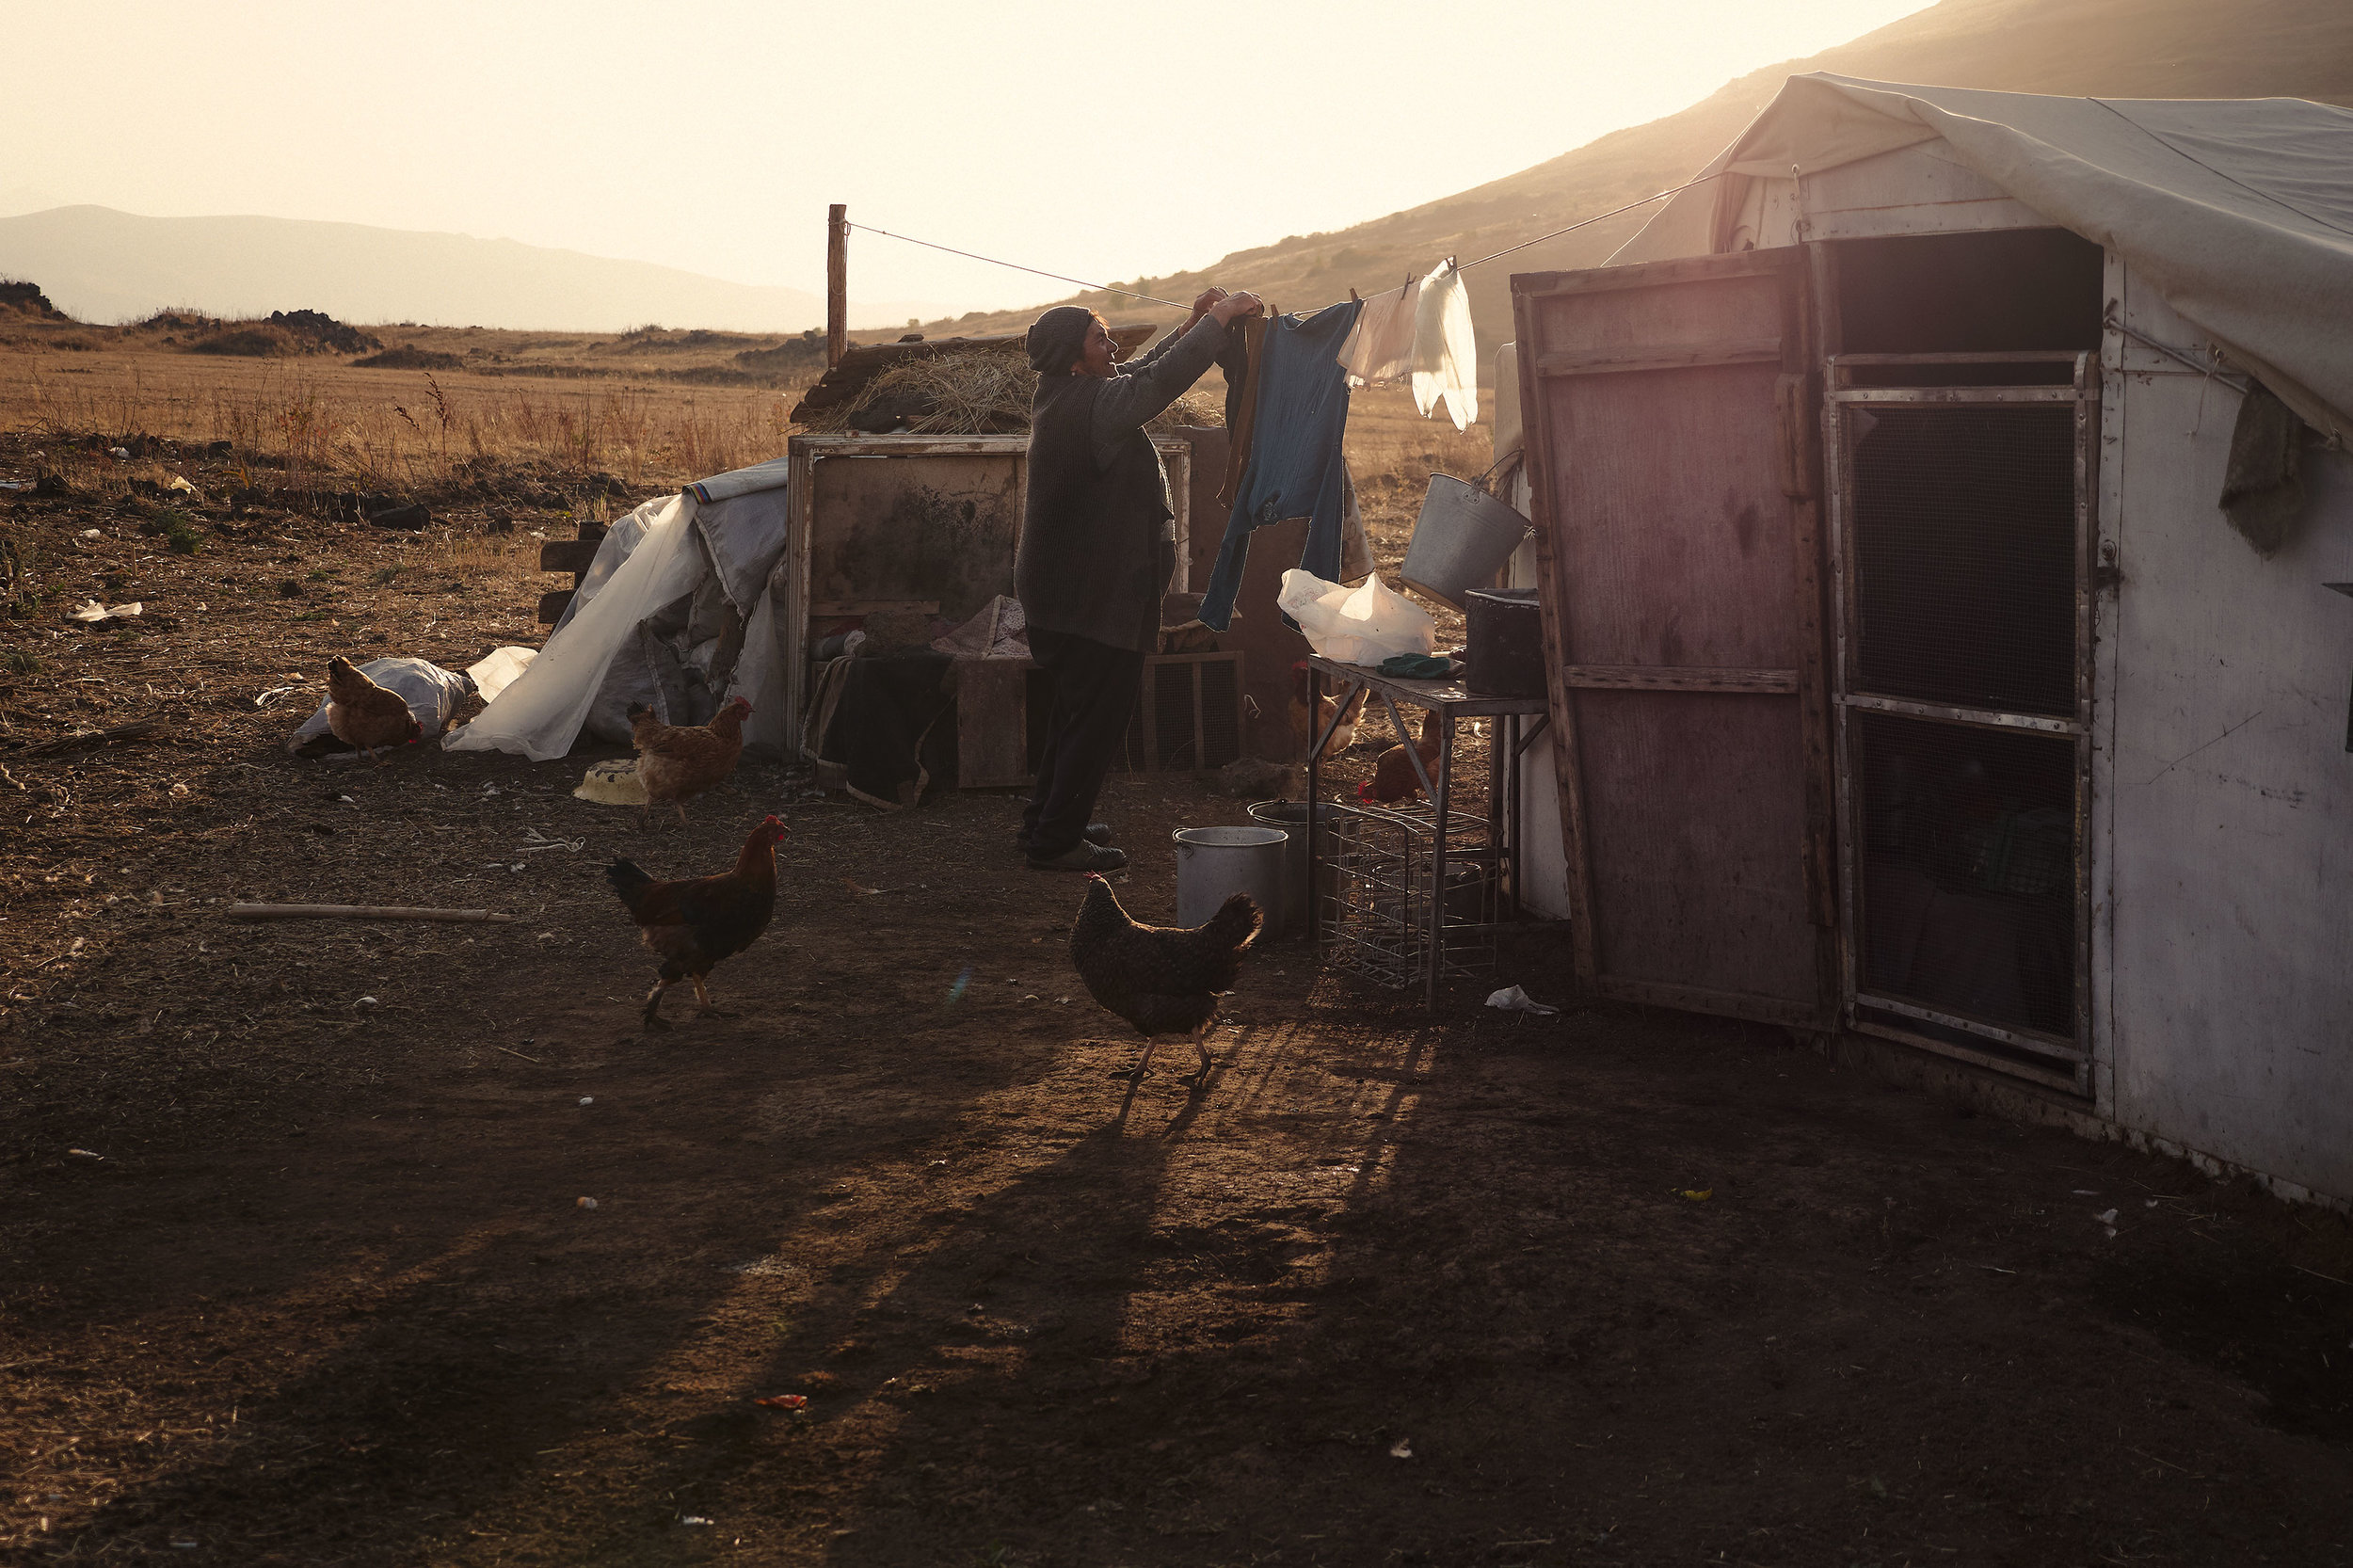 Armenia-Vayots-Sar-woman-hanging-laundry